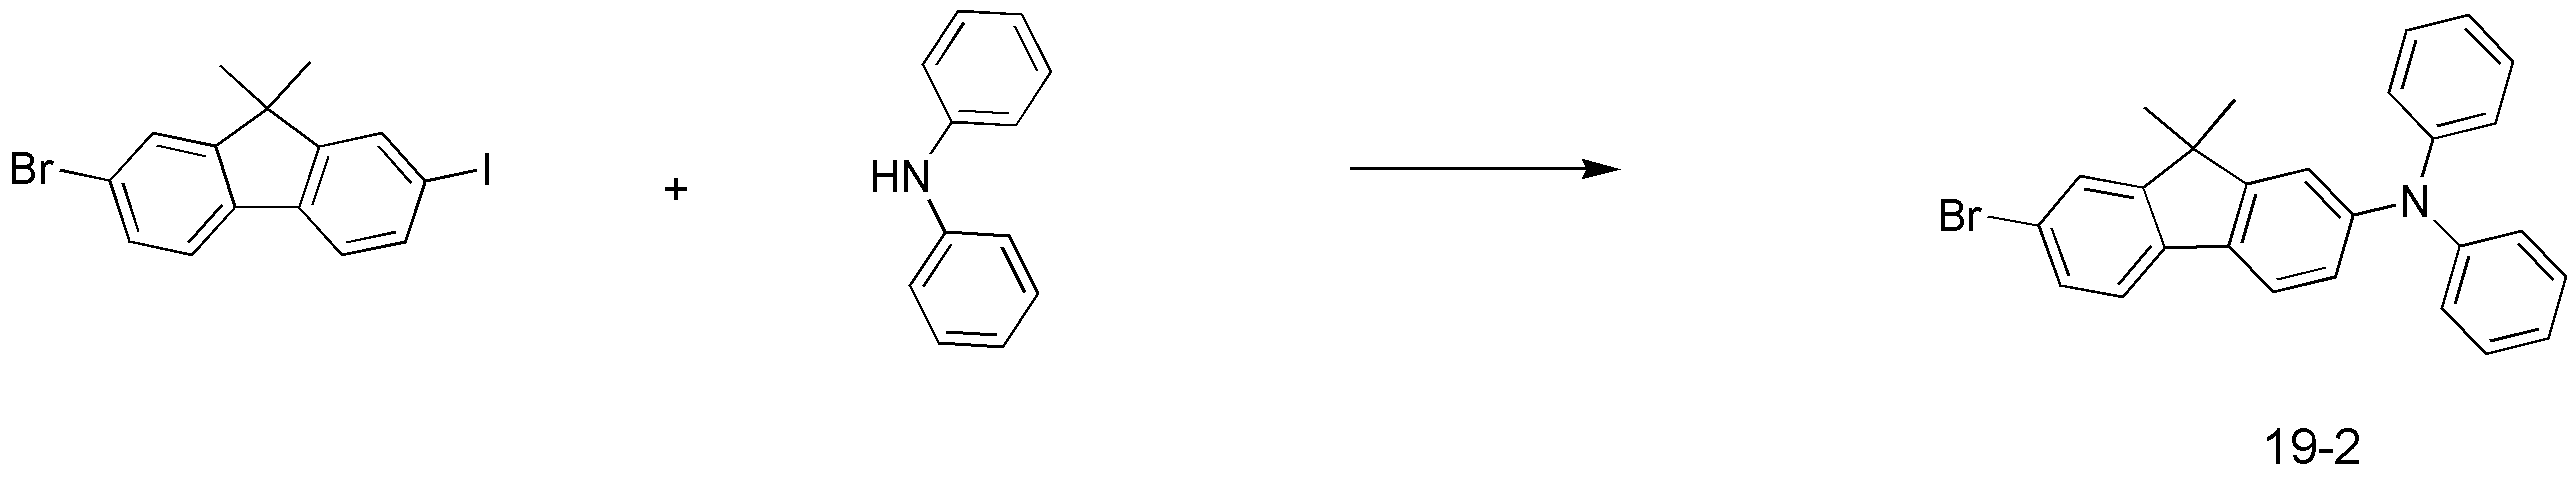 Figure pat00086